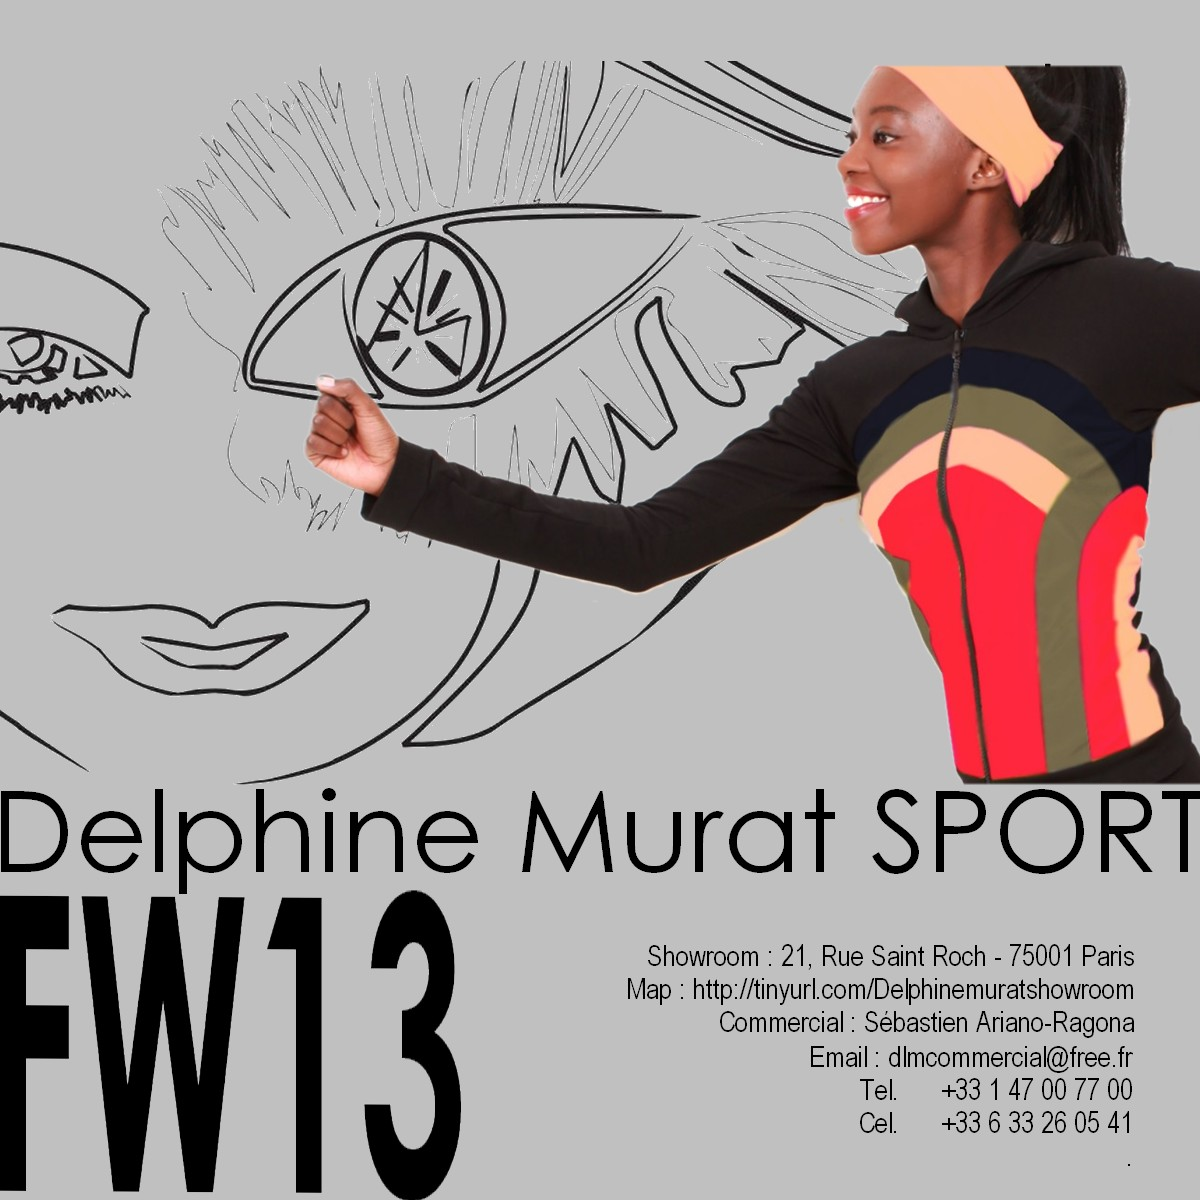 Delphine Murat FW13